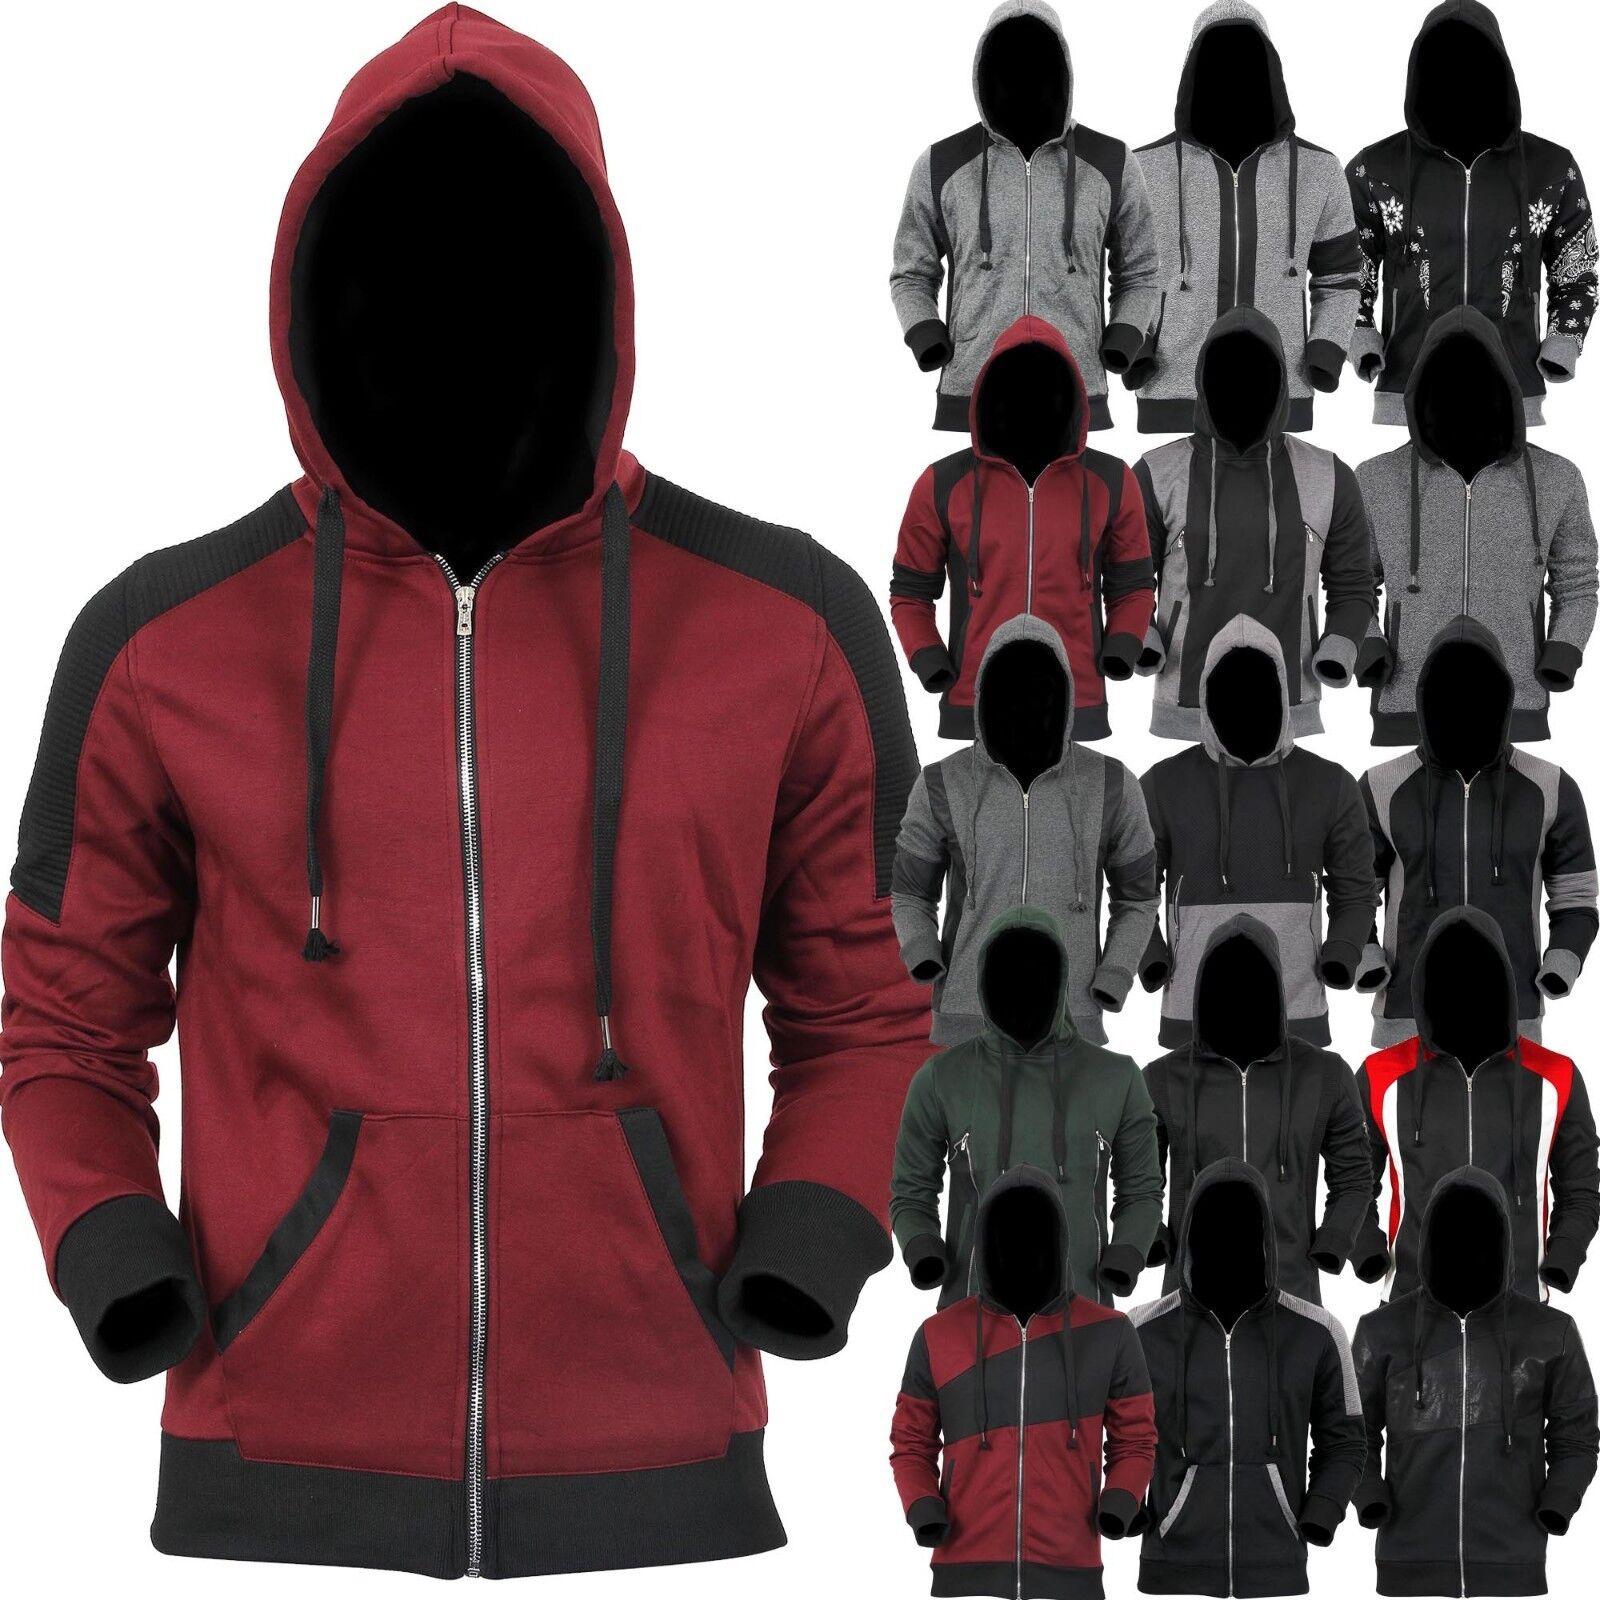 Mens Zip Up HOODIE Fleece Full Zipper Jacket Soft Sweater Pu